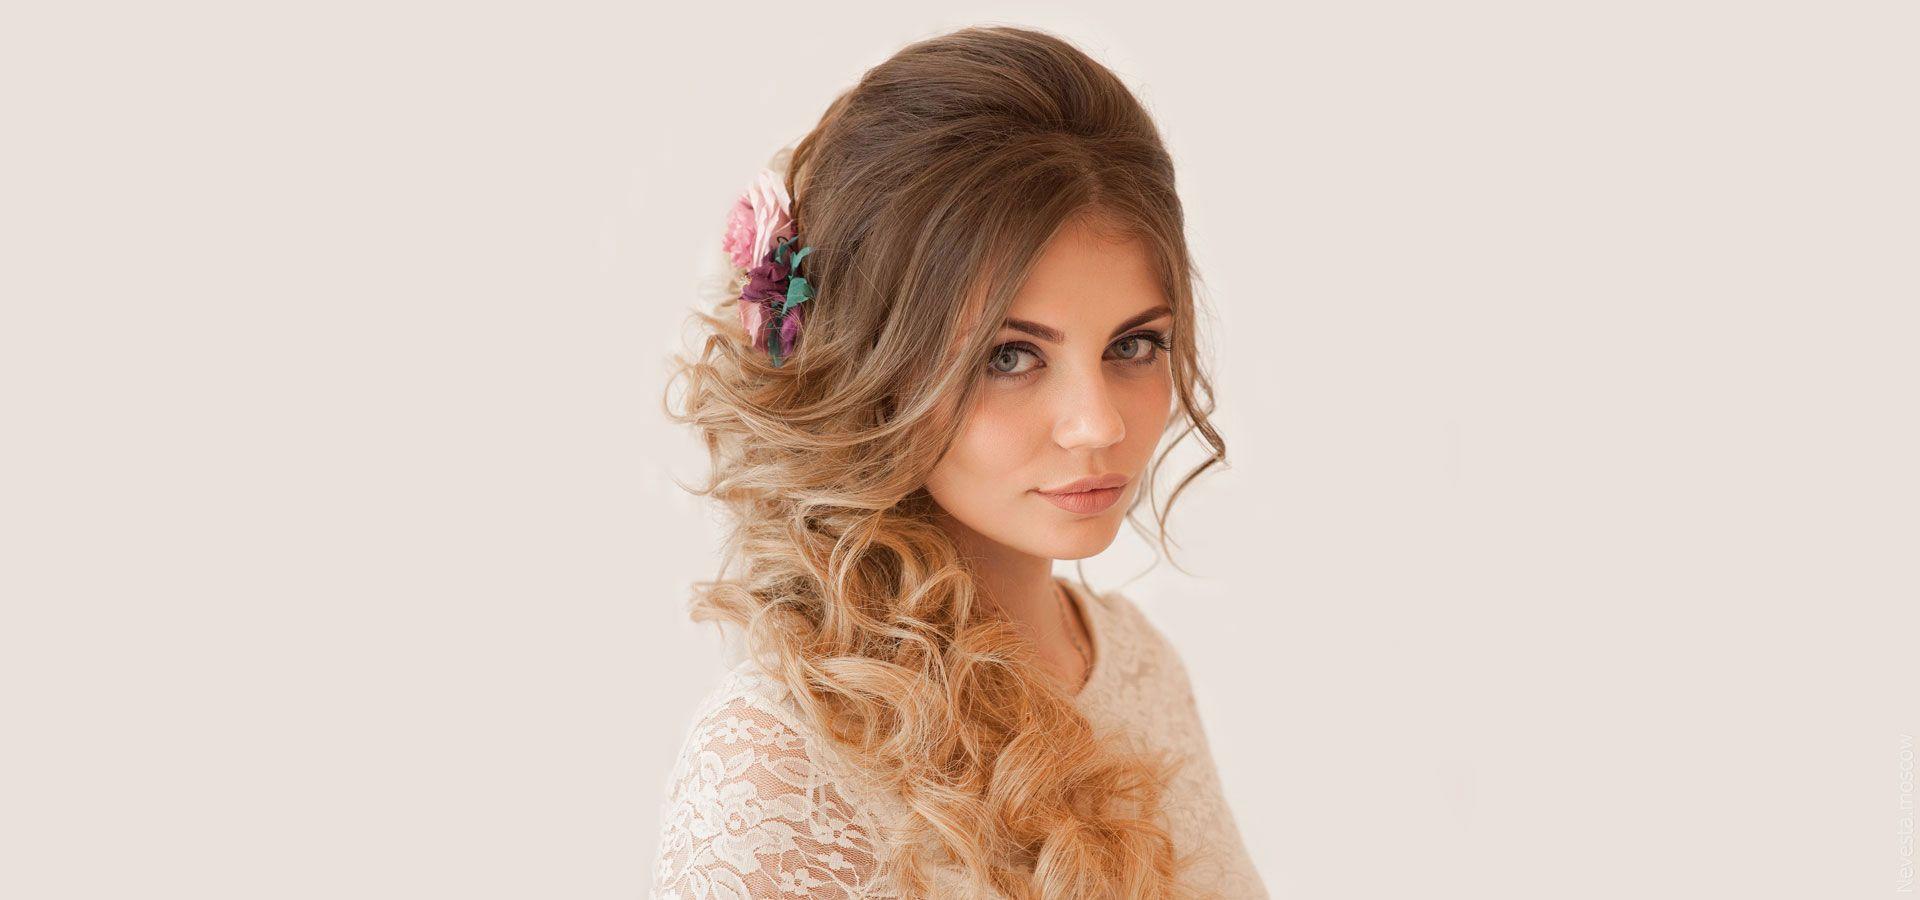 макияж от стилиста, к свадьбе